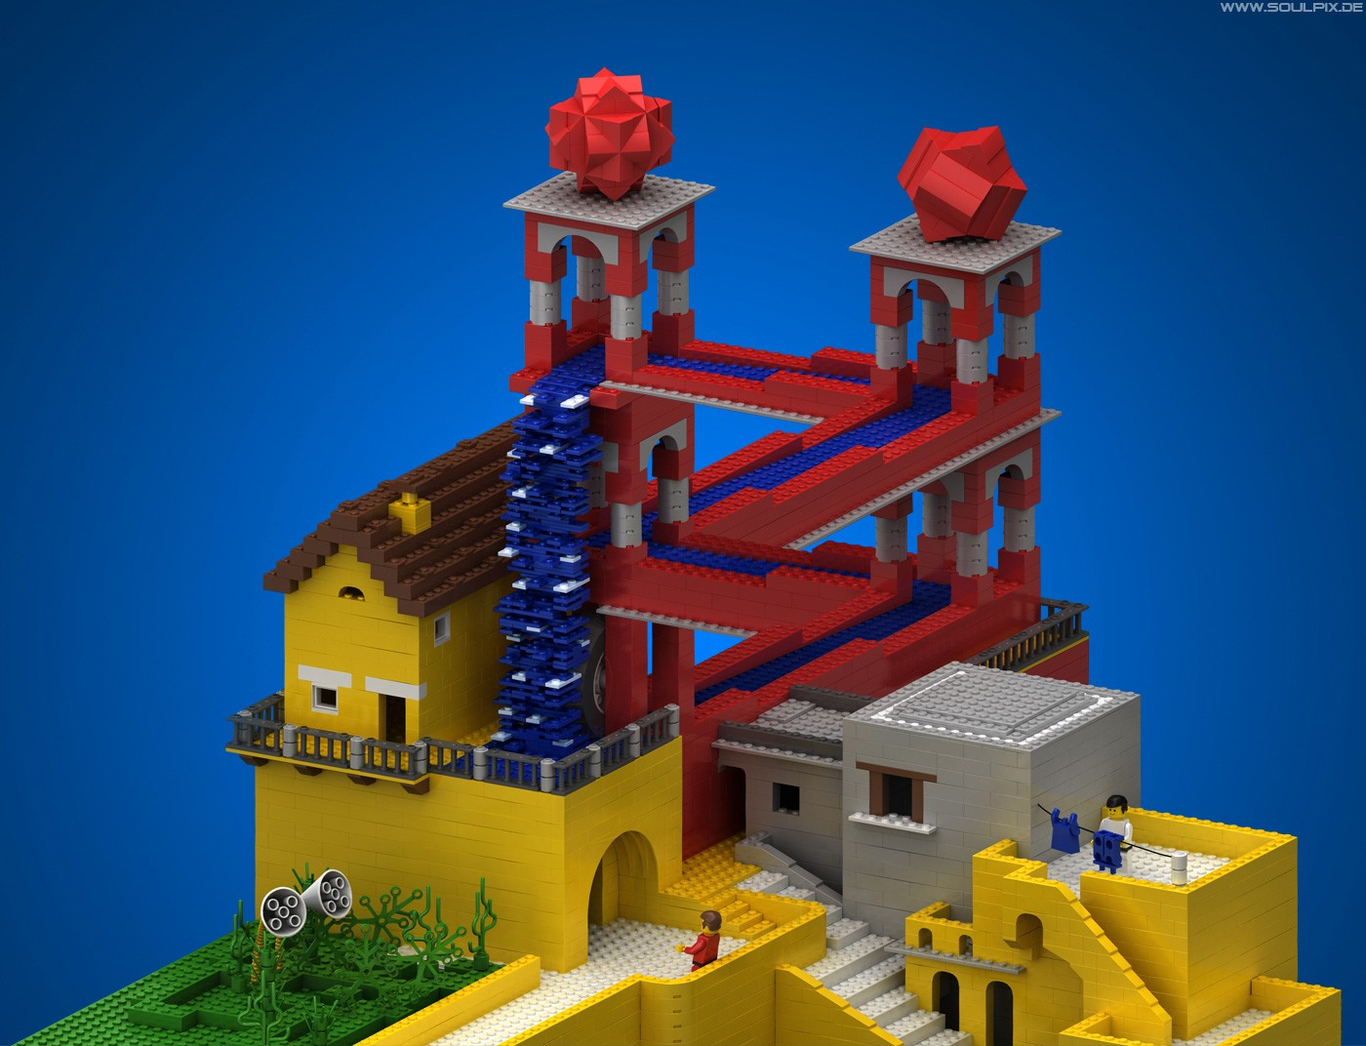 Okazaky lego escher 1 6f3a163c cqh4